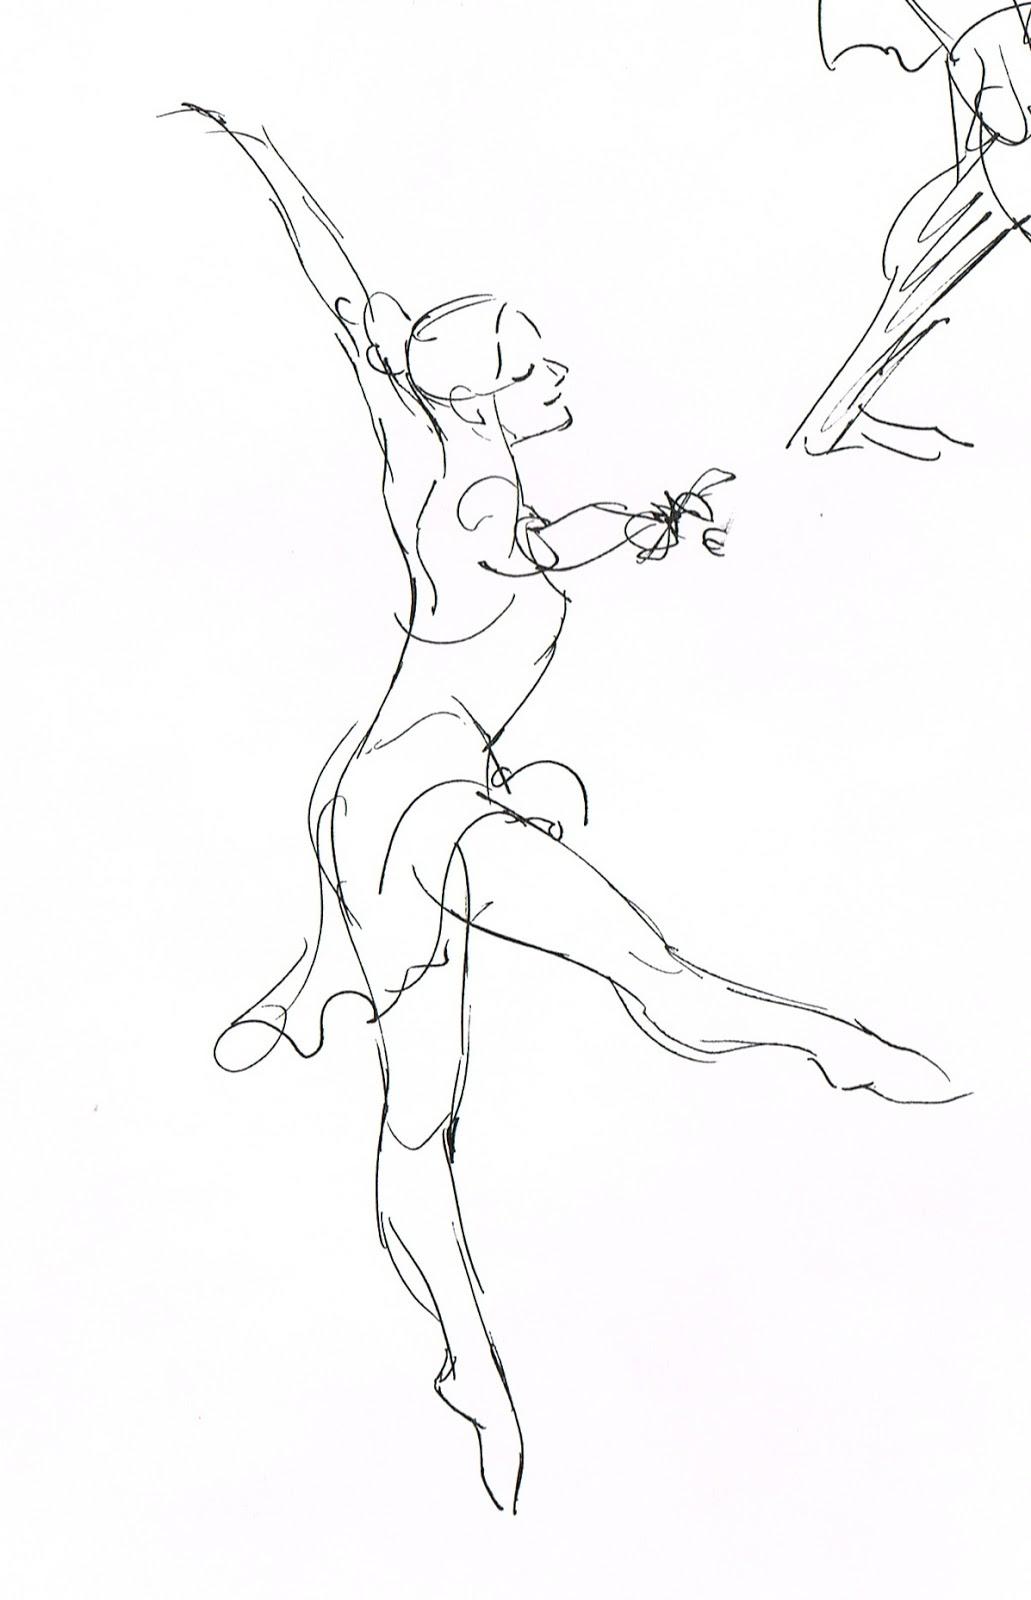 1031x1600 Drawn Ballerine Man Easy